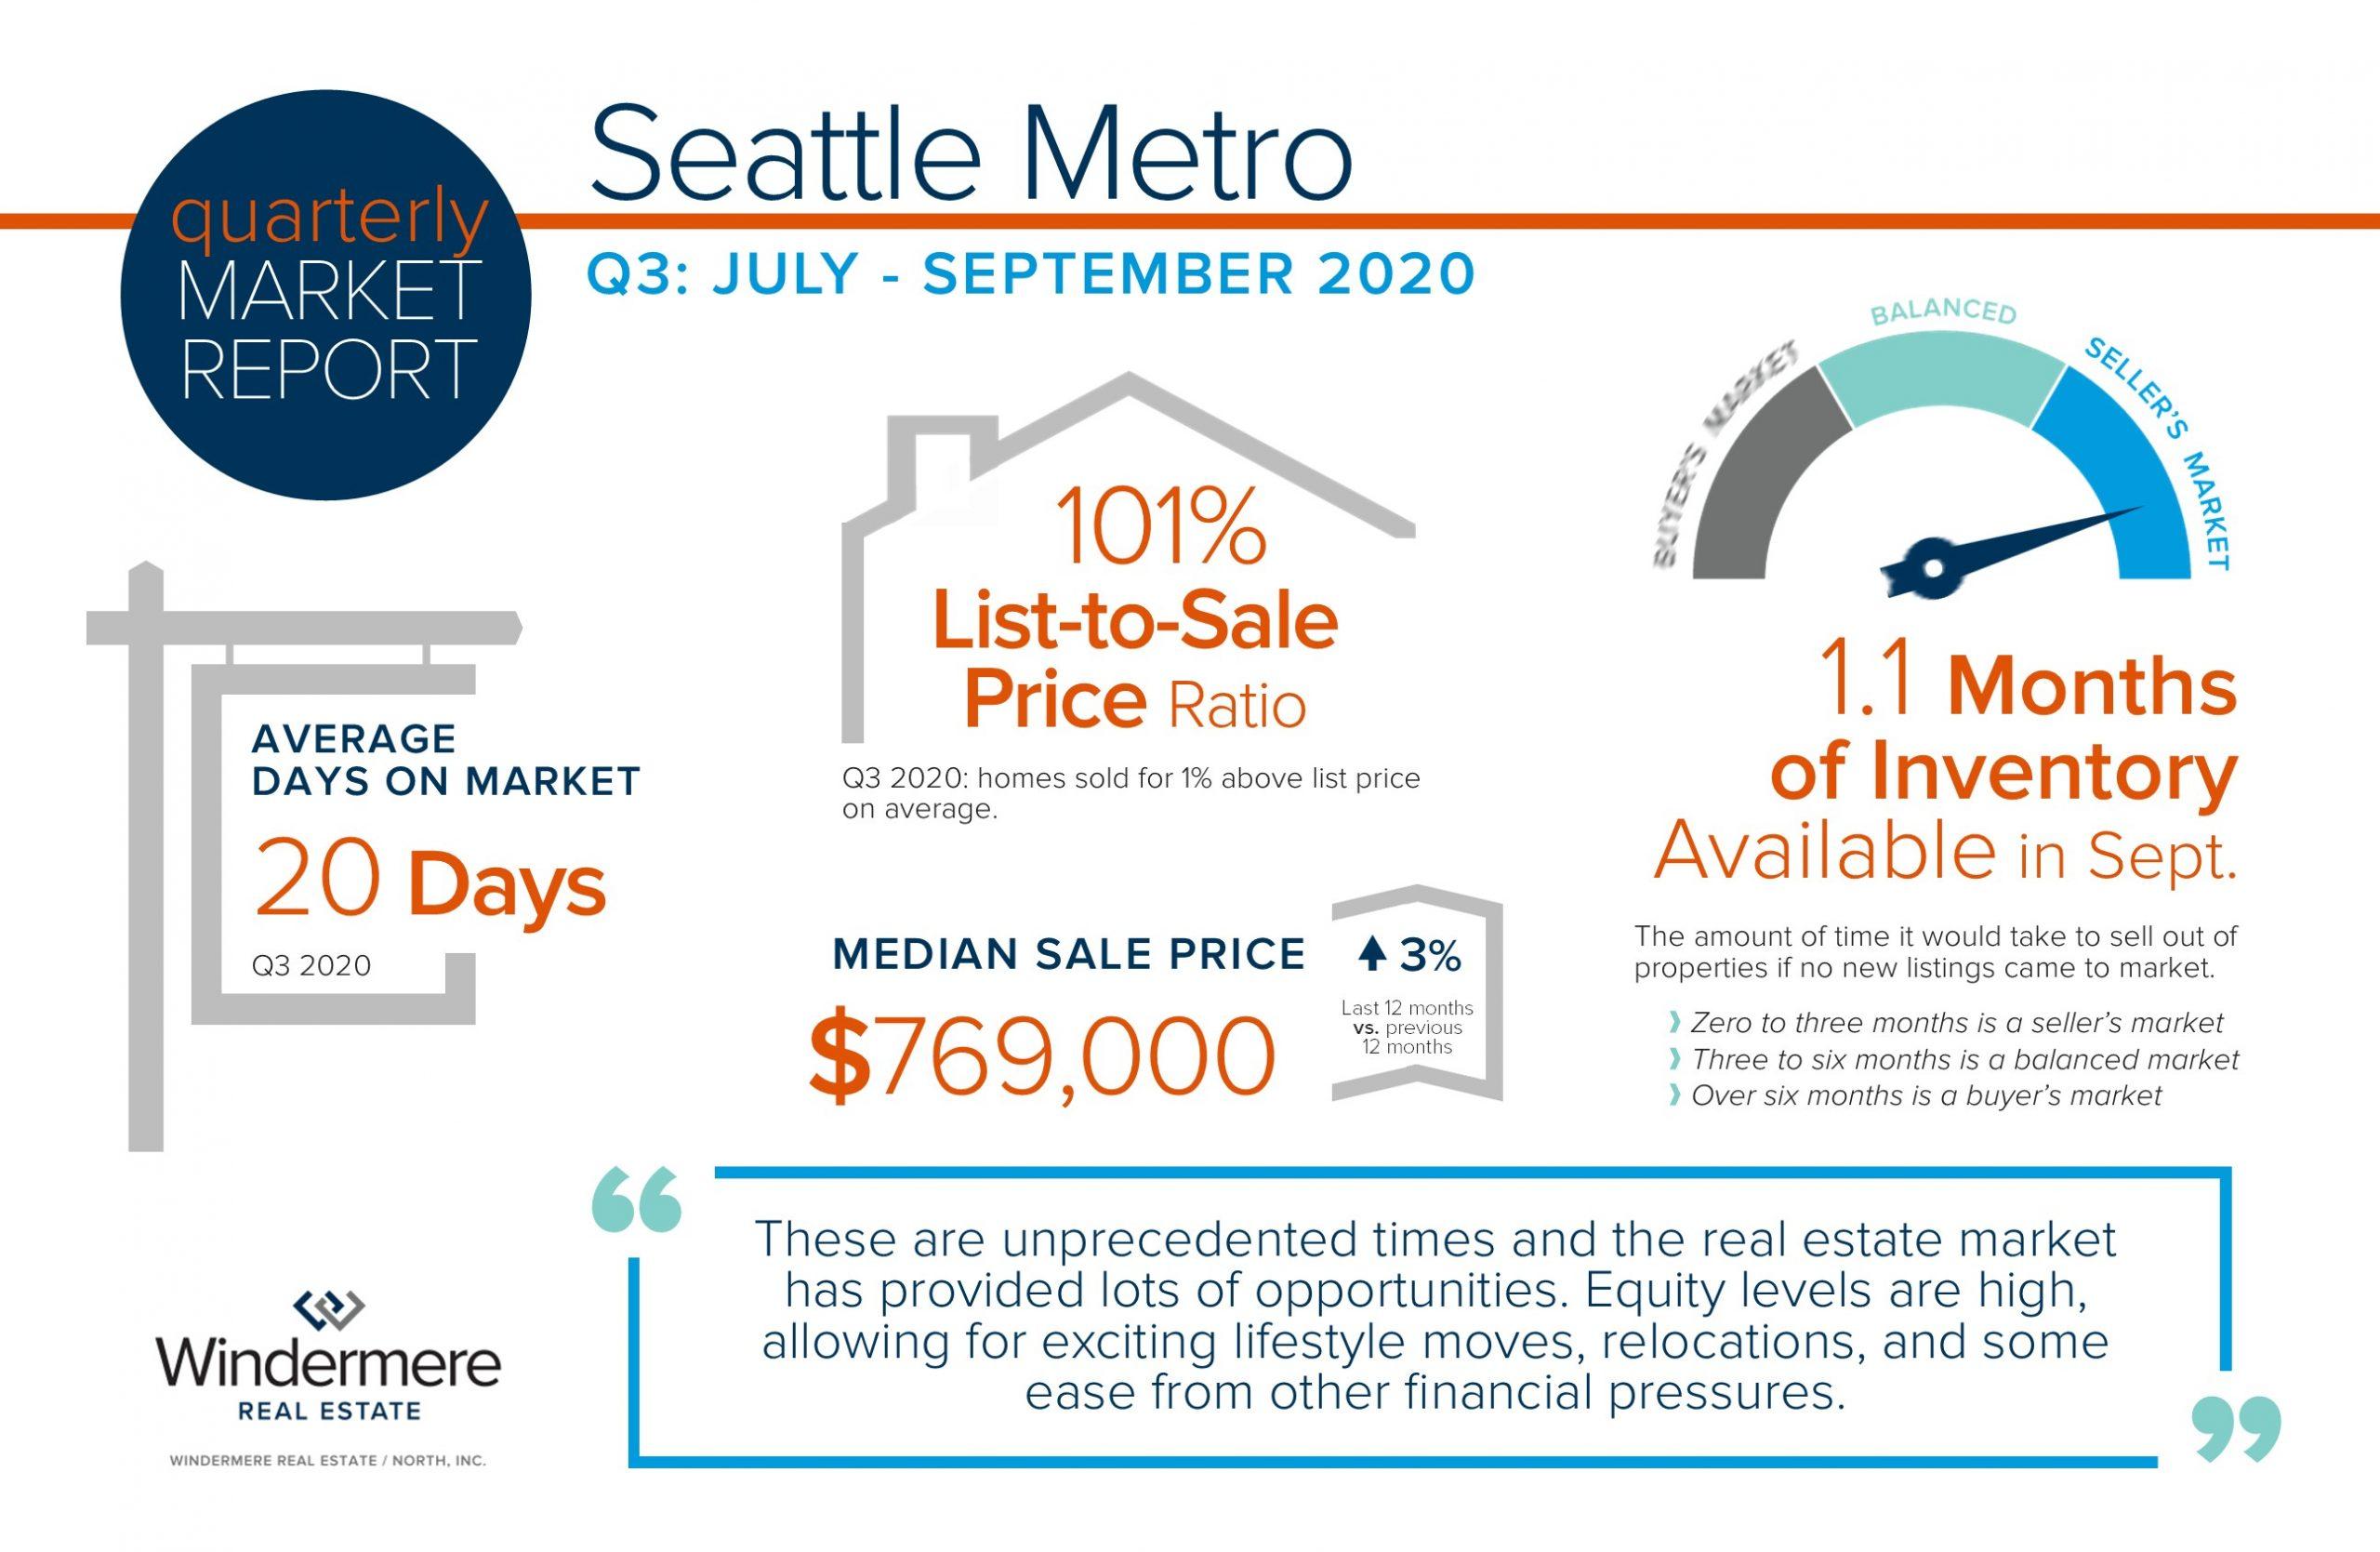 Seattle-Metro-BLOG-Image-scaled.jpg